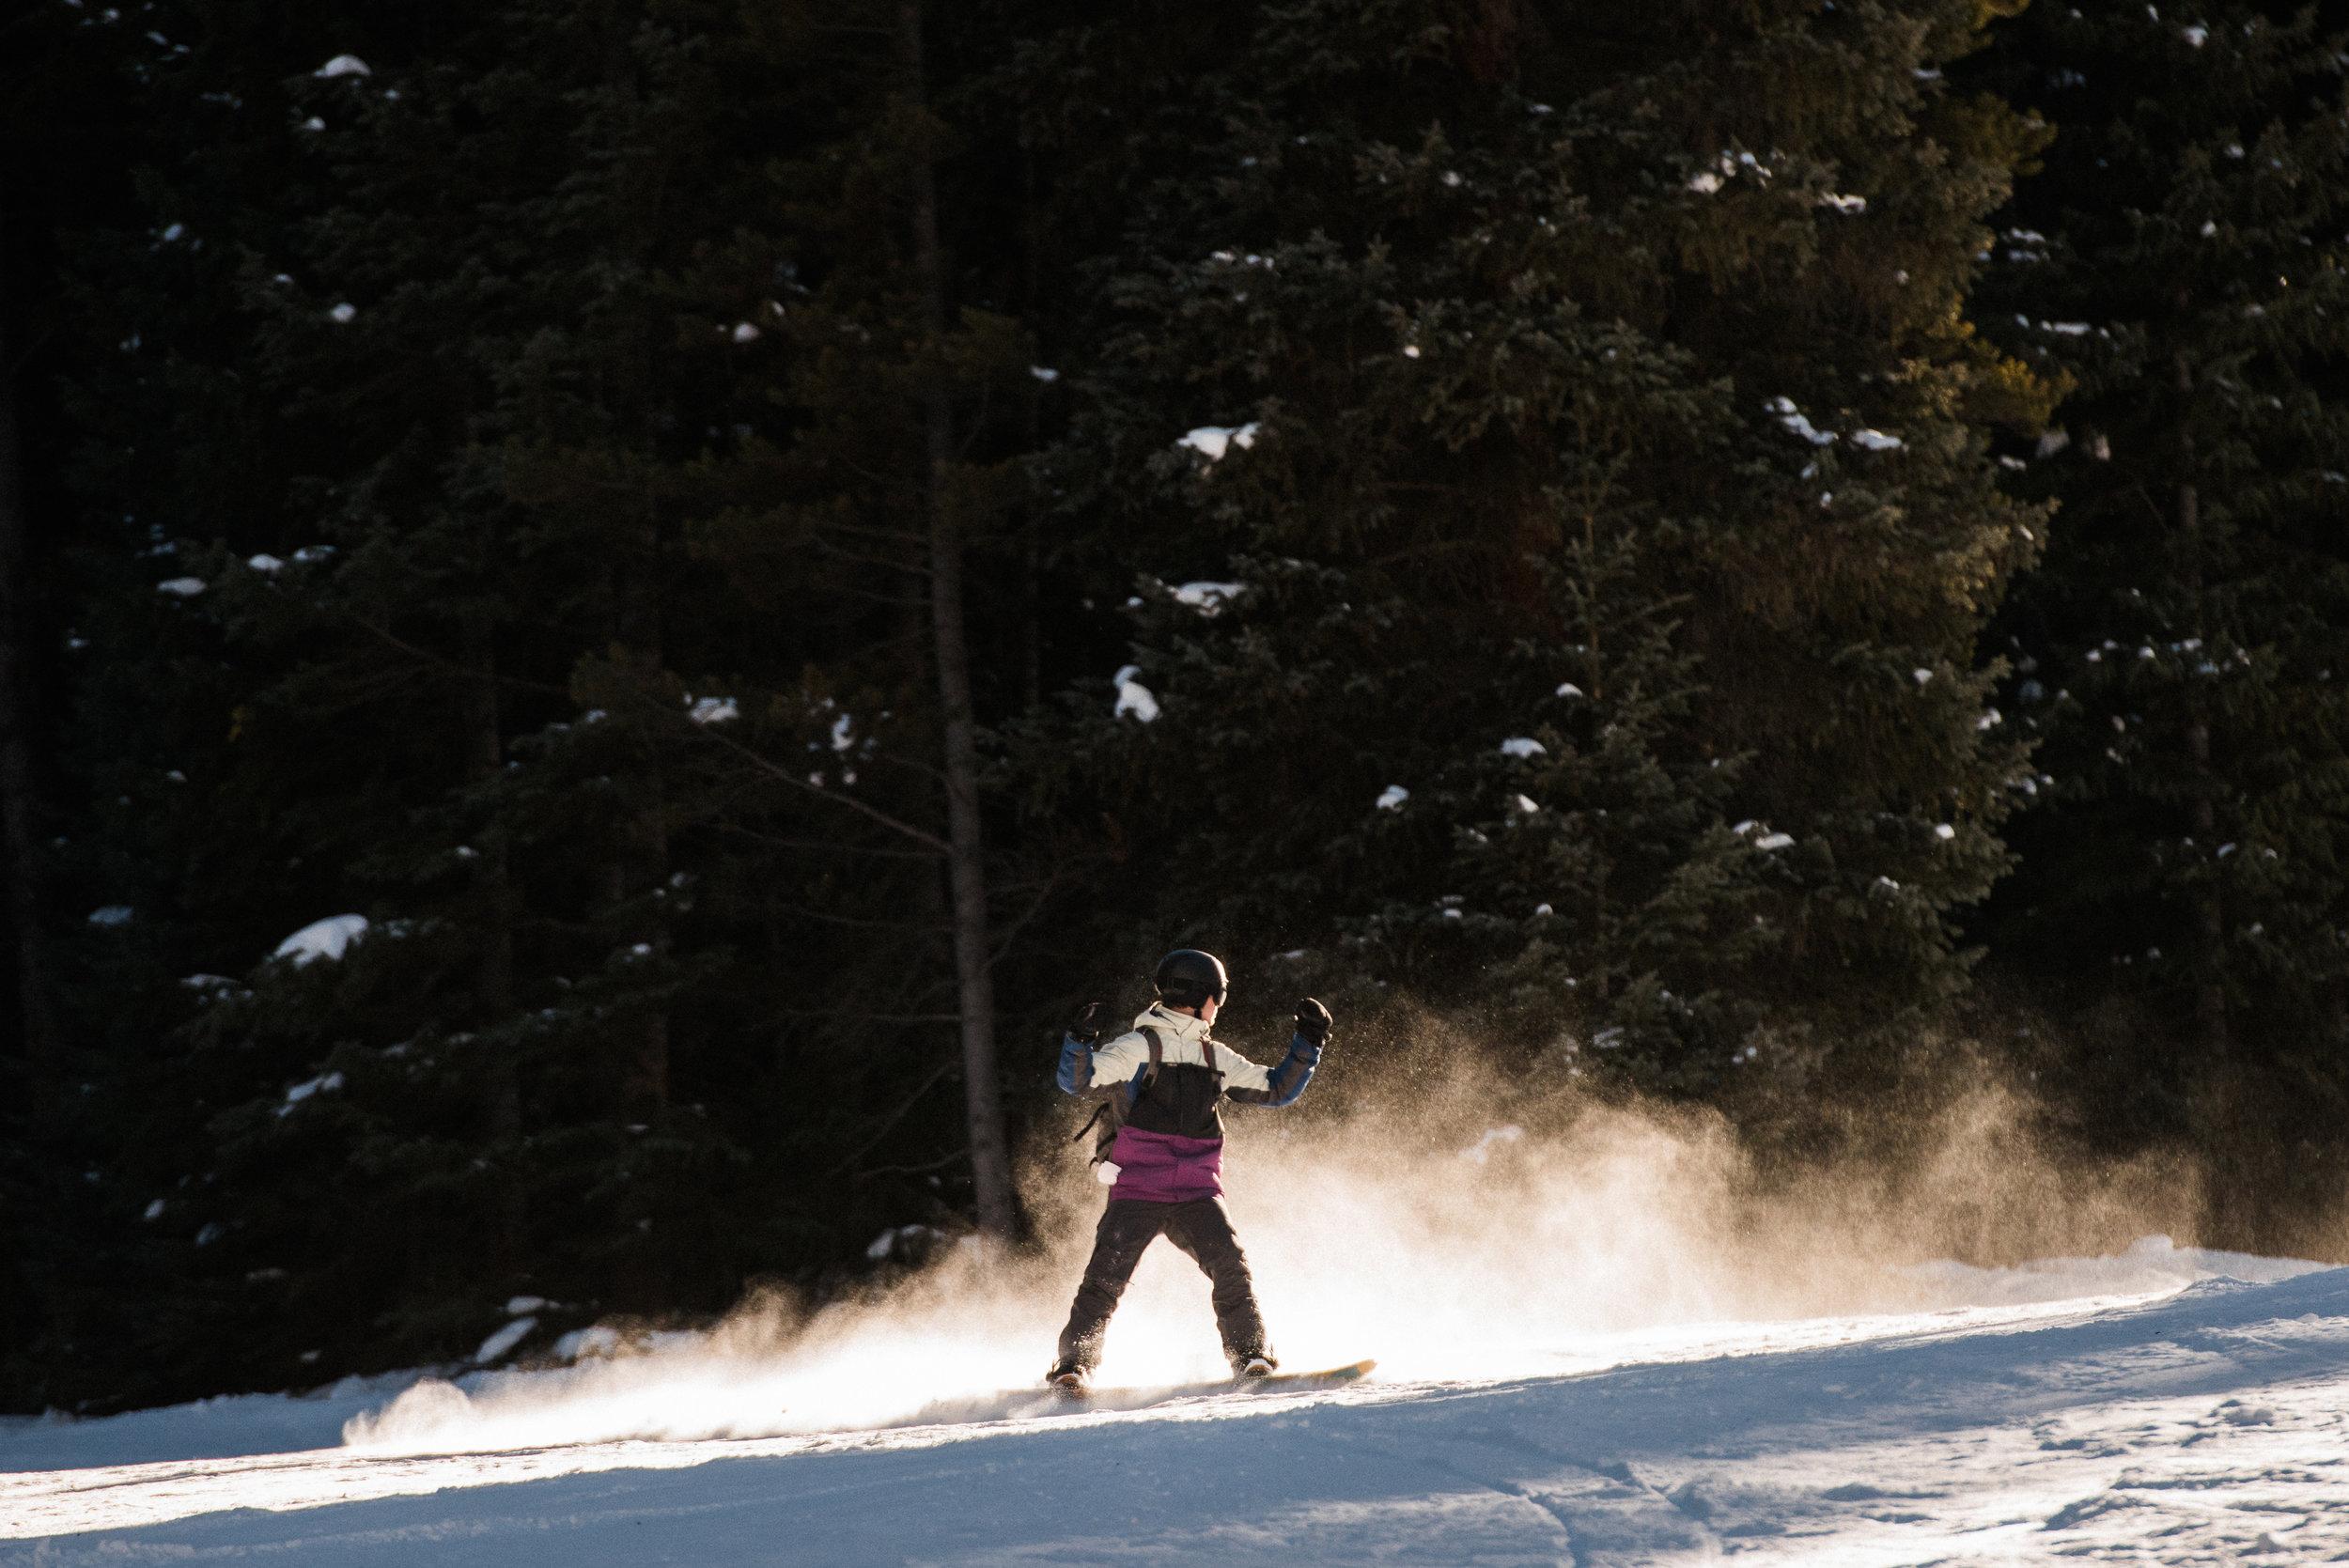 TaraShupe_Outdoor_Photographer_Loweprobags_Colorado_Copper_Mountains_Ski_47.jpg